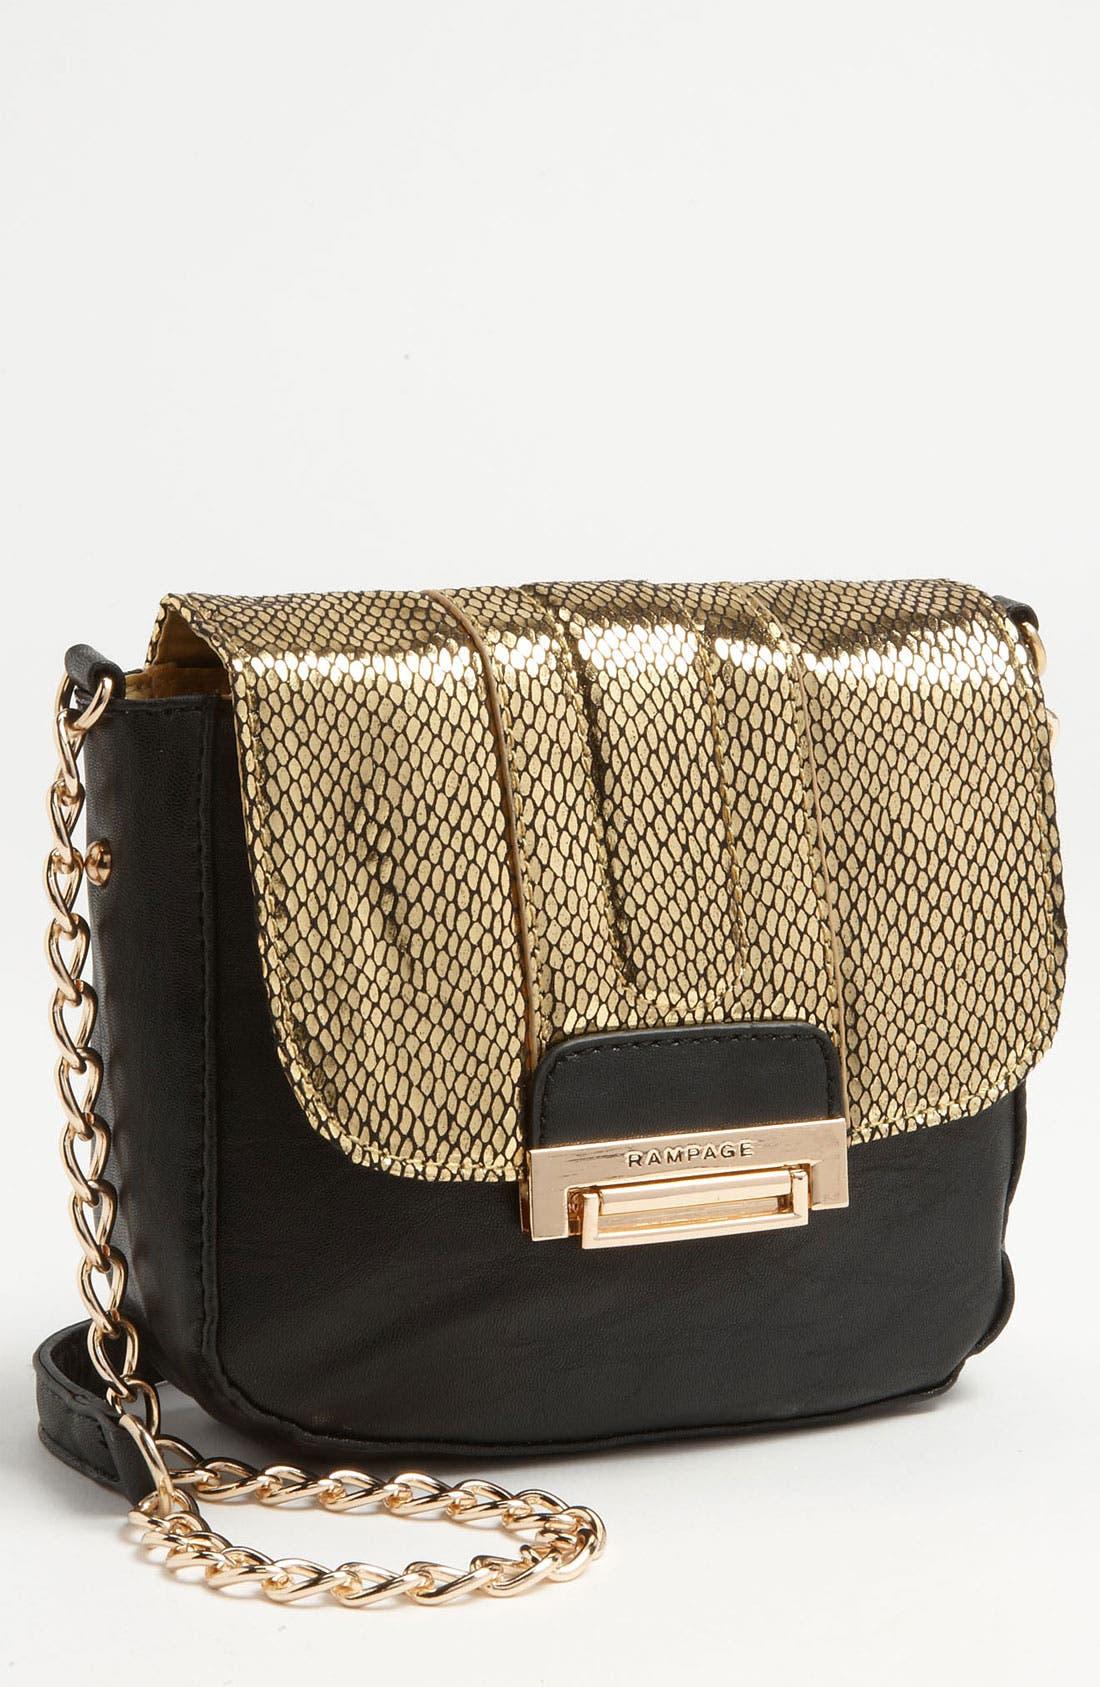 Main Image - Rampage 'Lillian' Crossbody Bag